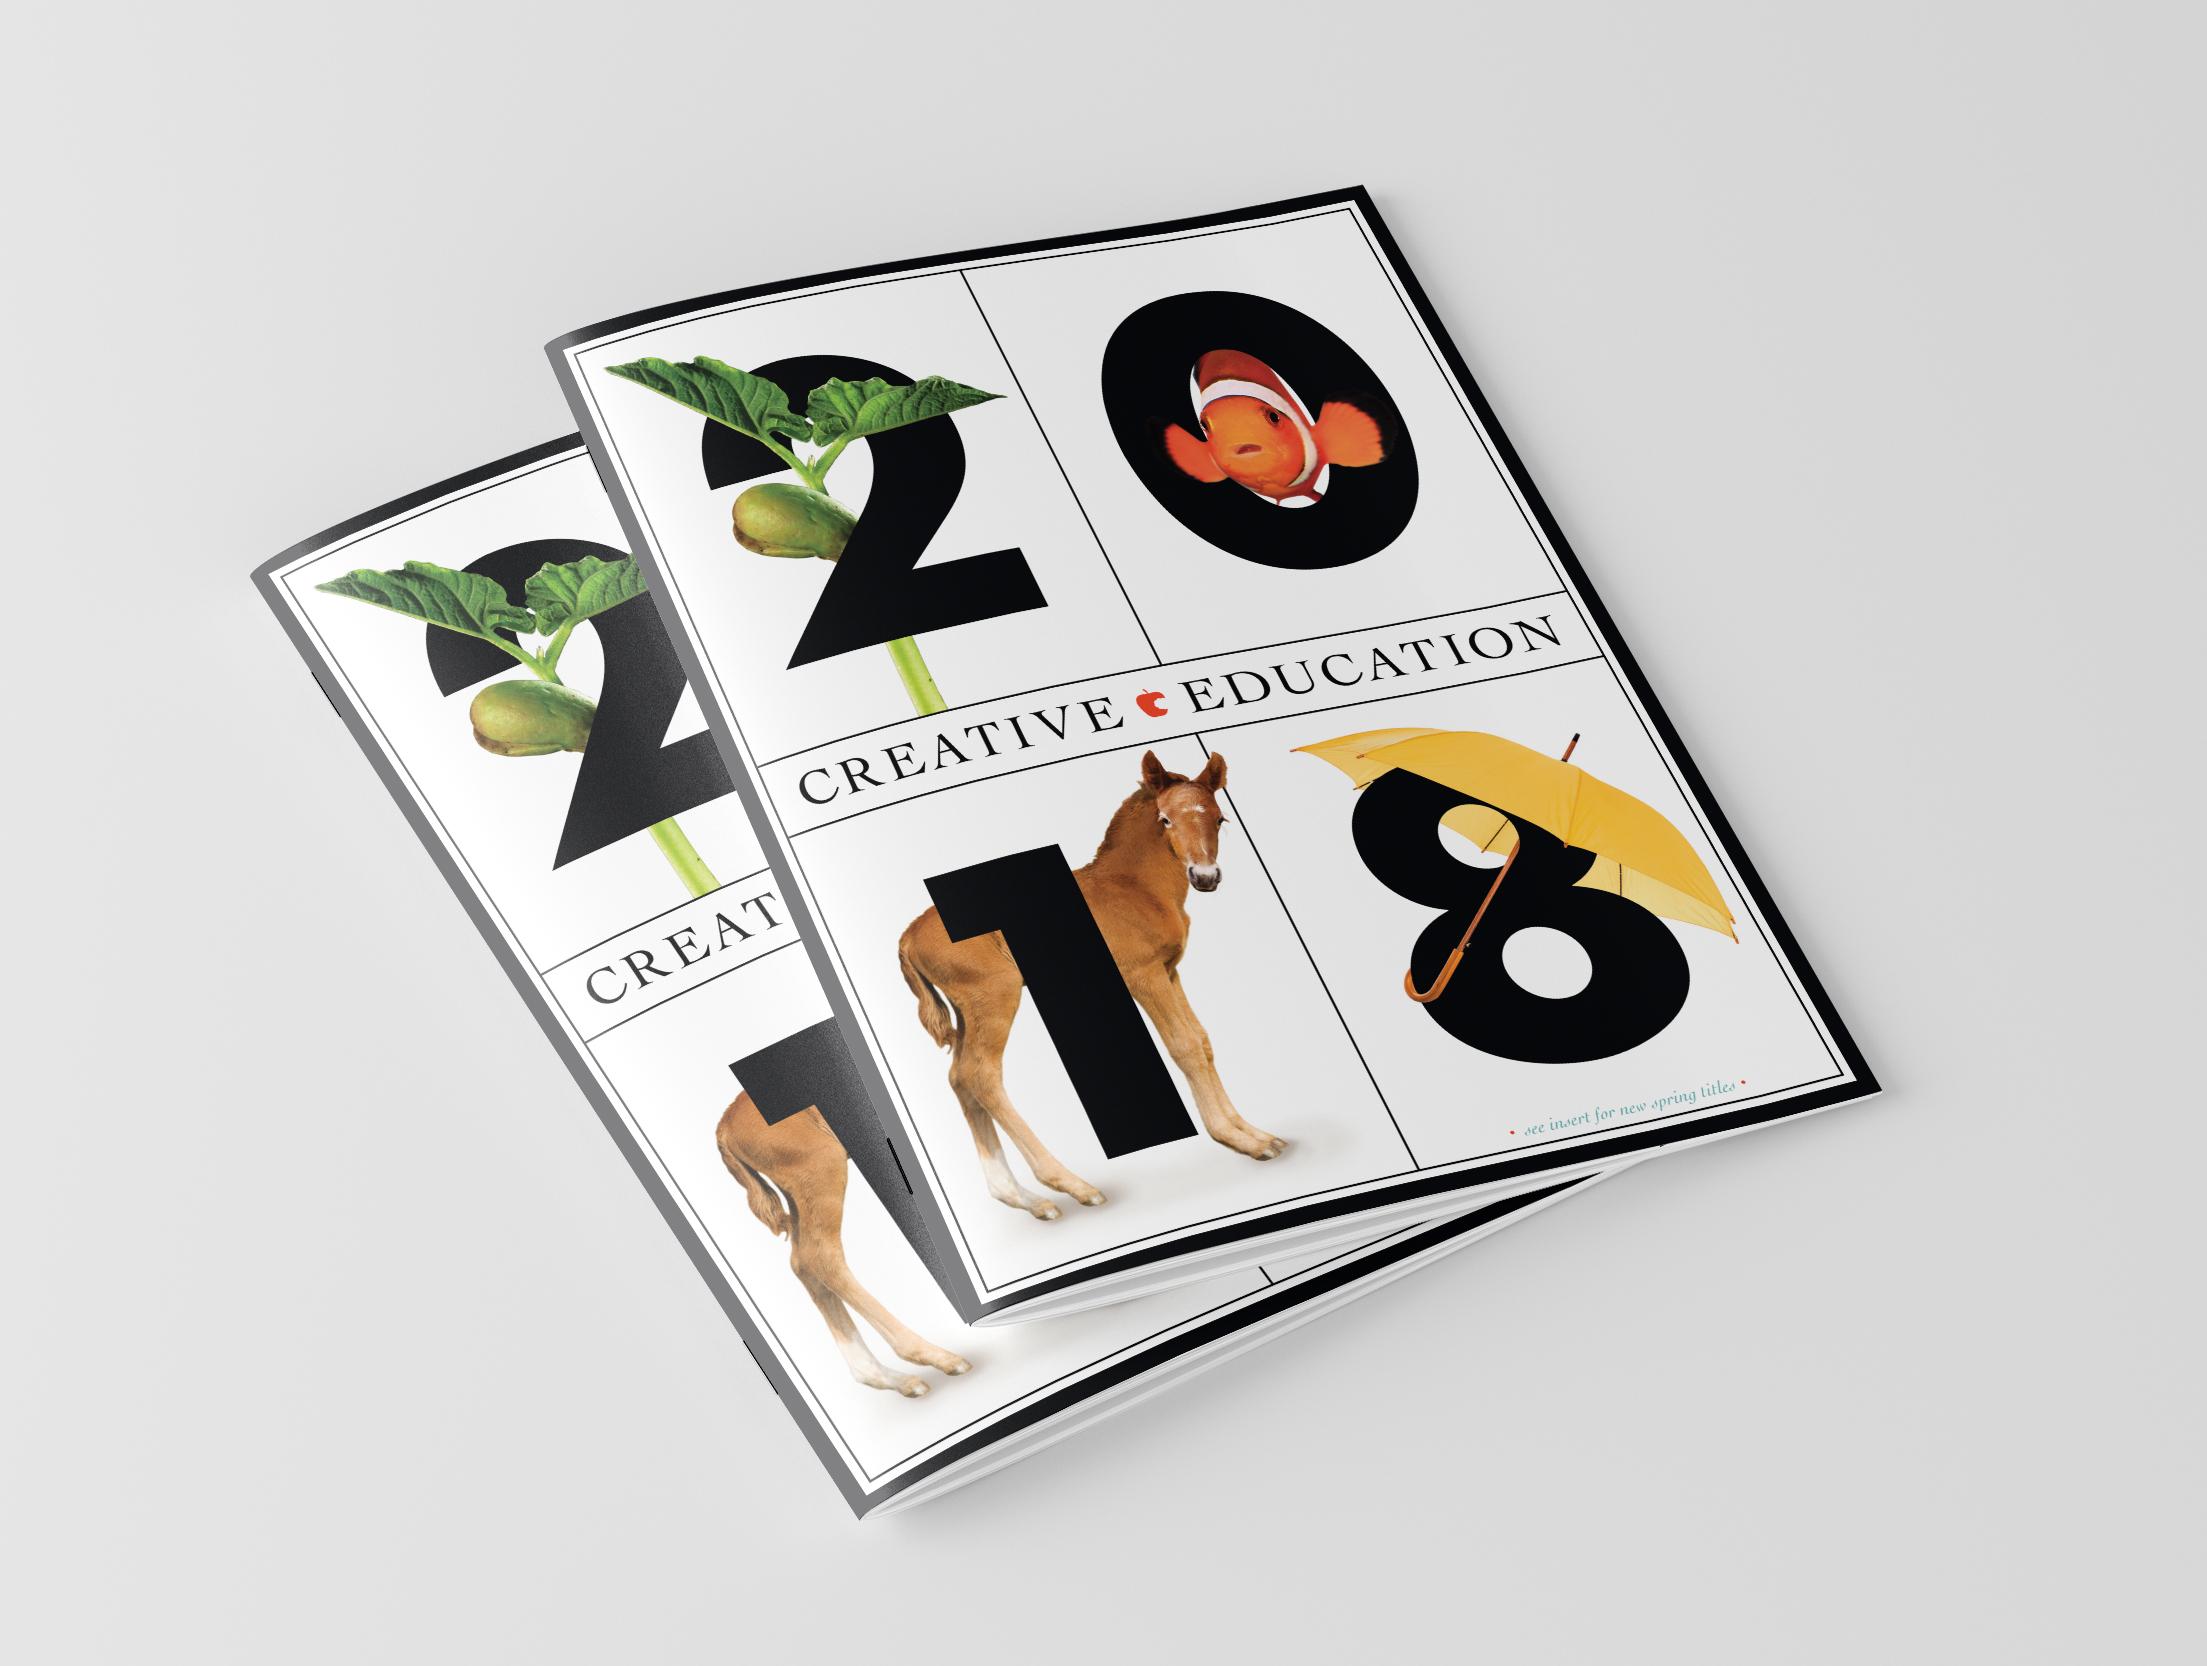 CVanderbeek_Creative Education Catalog 1.jpg